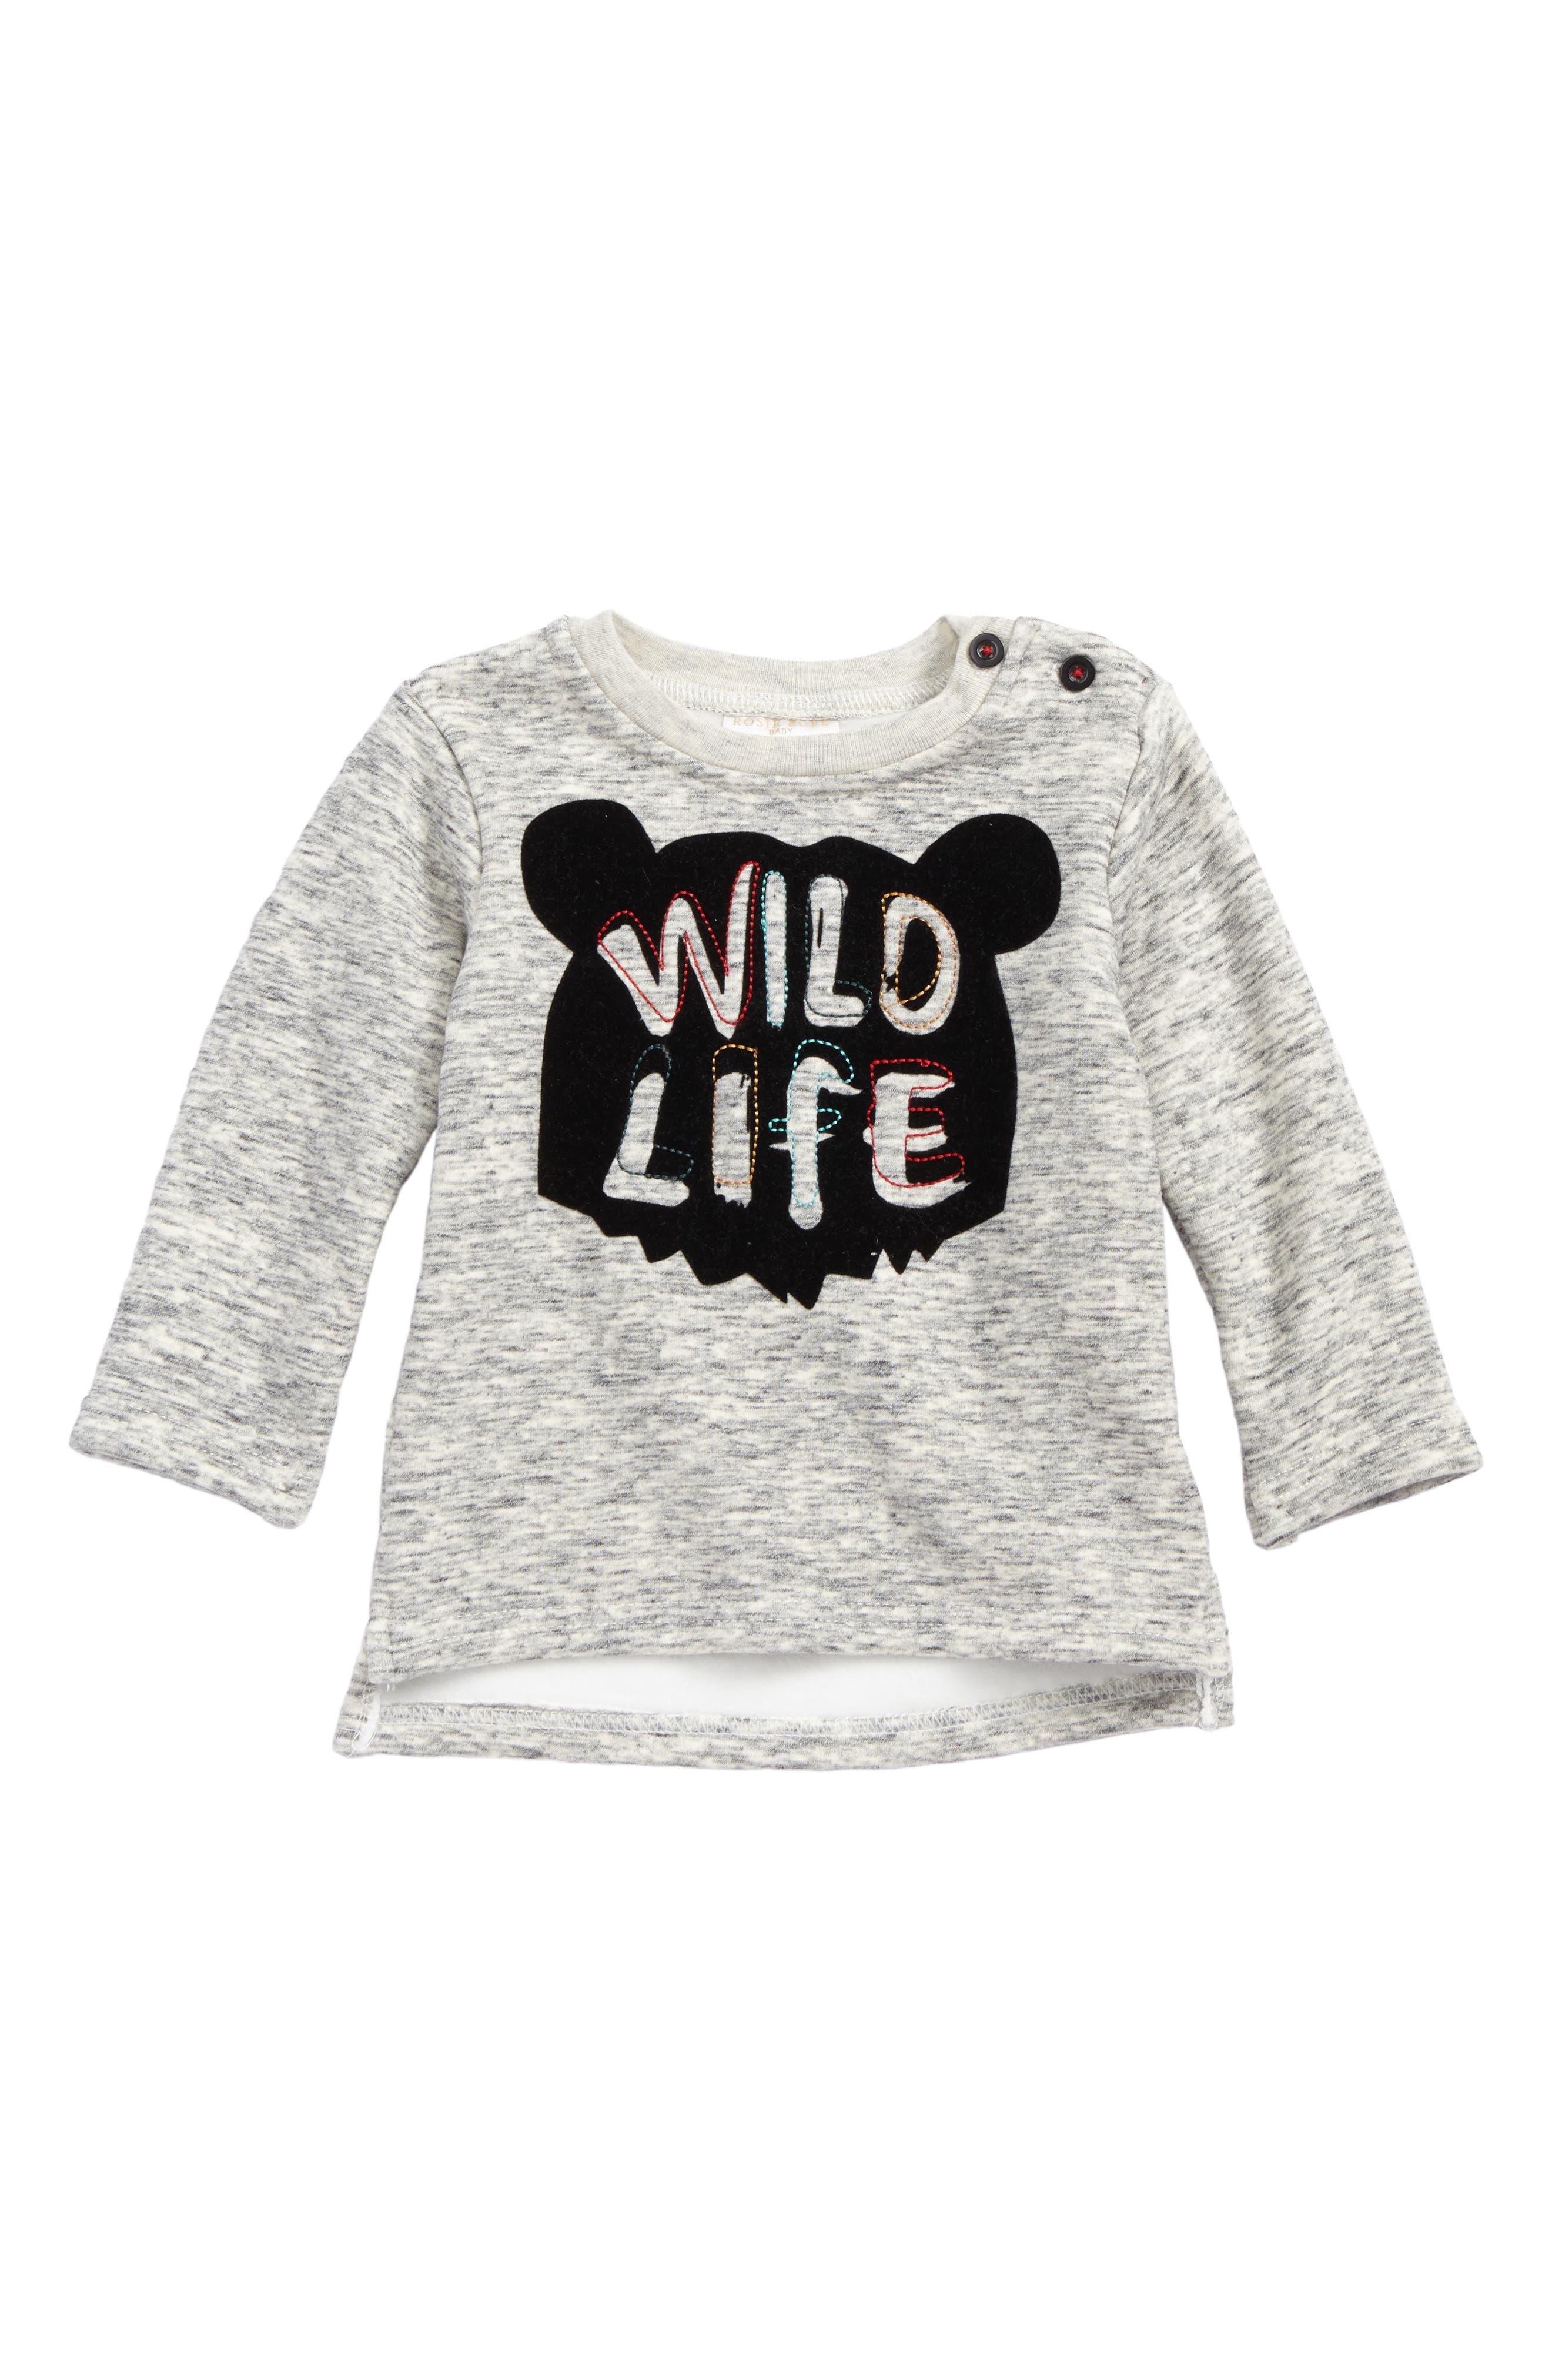 Alternate Image 1 Selected - Rosie Pope Wild Life Sweatshirt (Baby Boys)